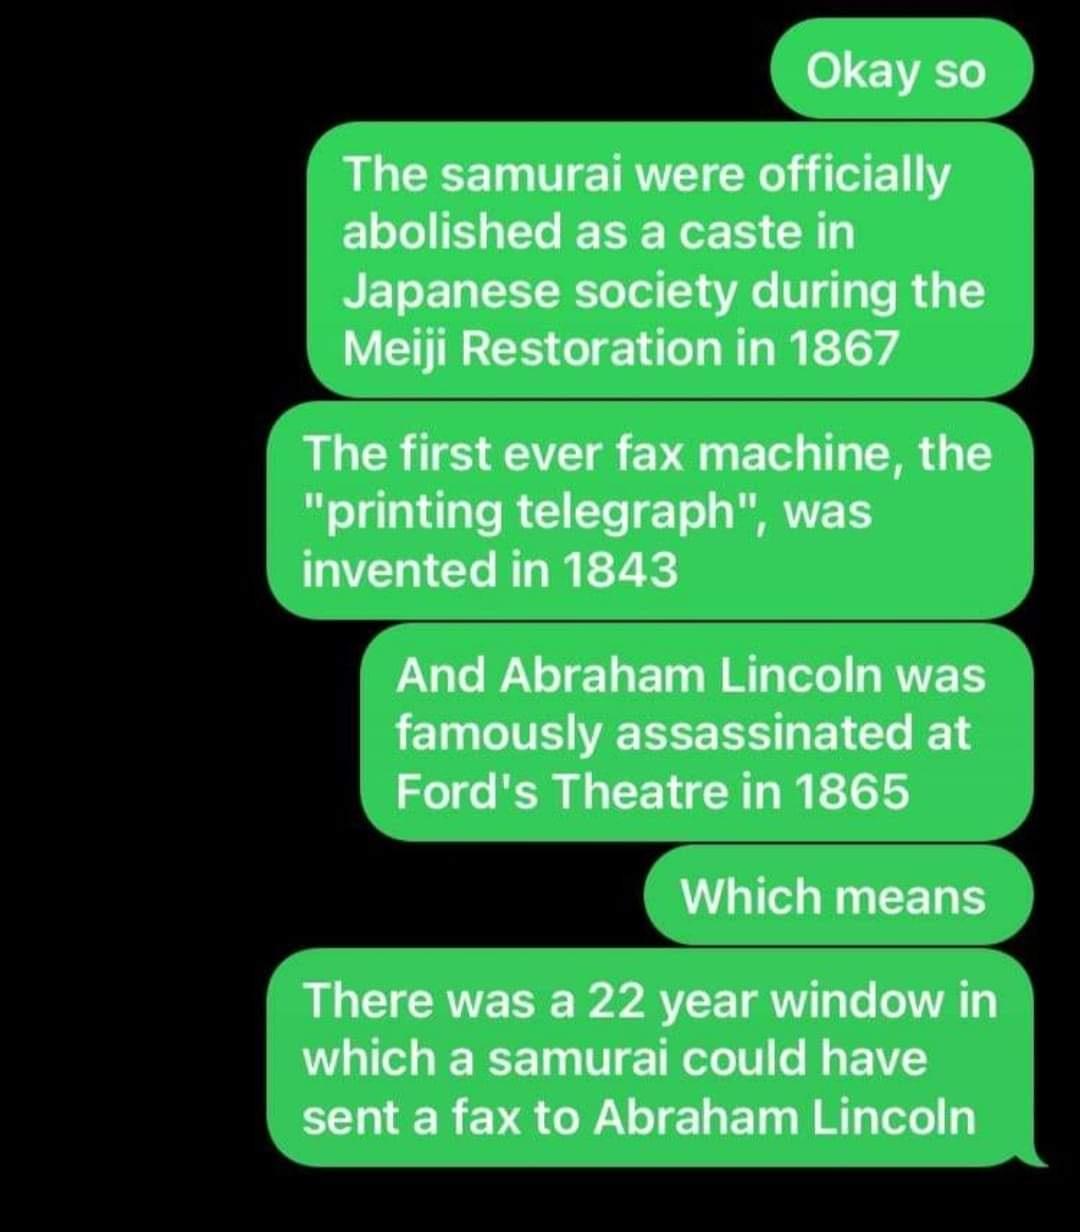 abraham lincoln samurai fax machine